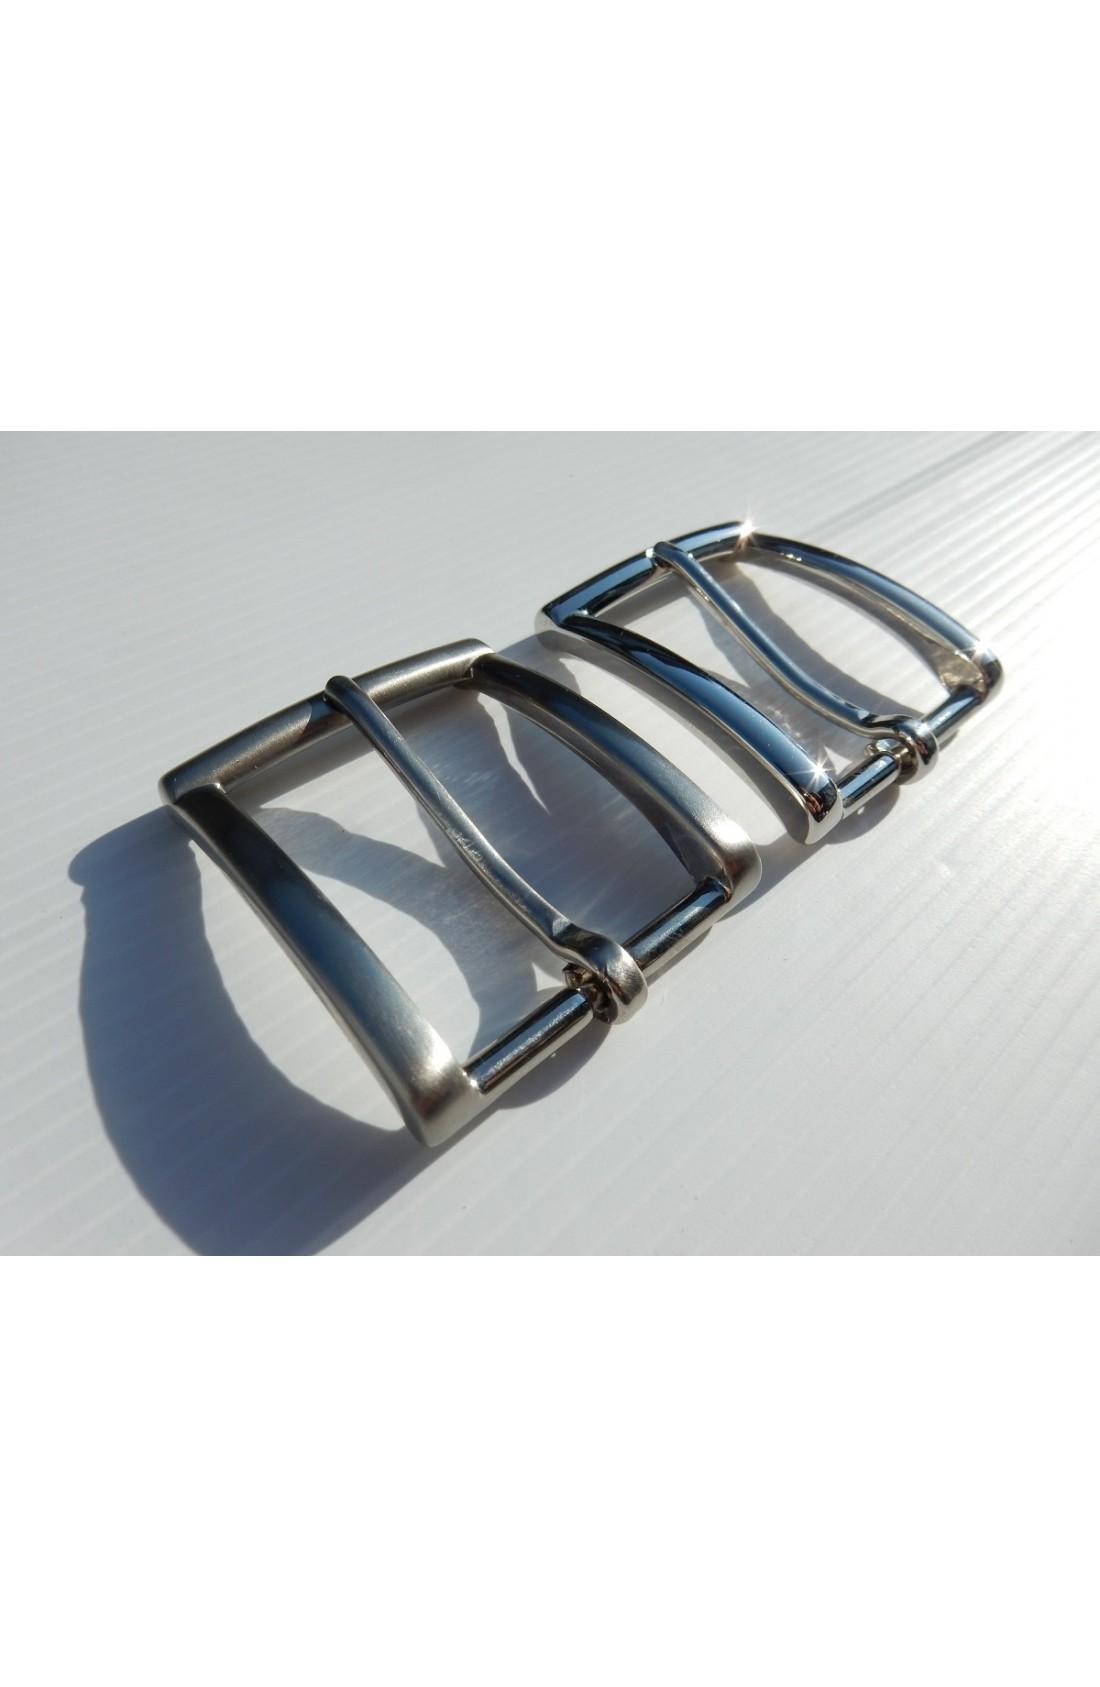 Fibbia Standard I 113 mm.35 nikel e nikel satinato (3)